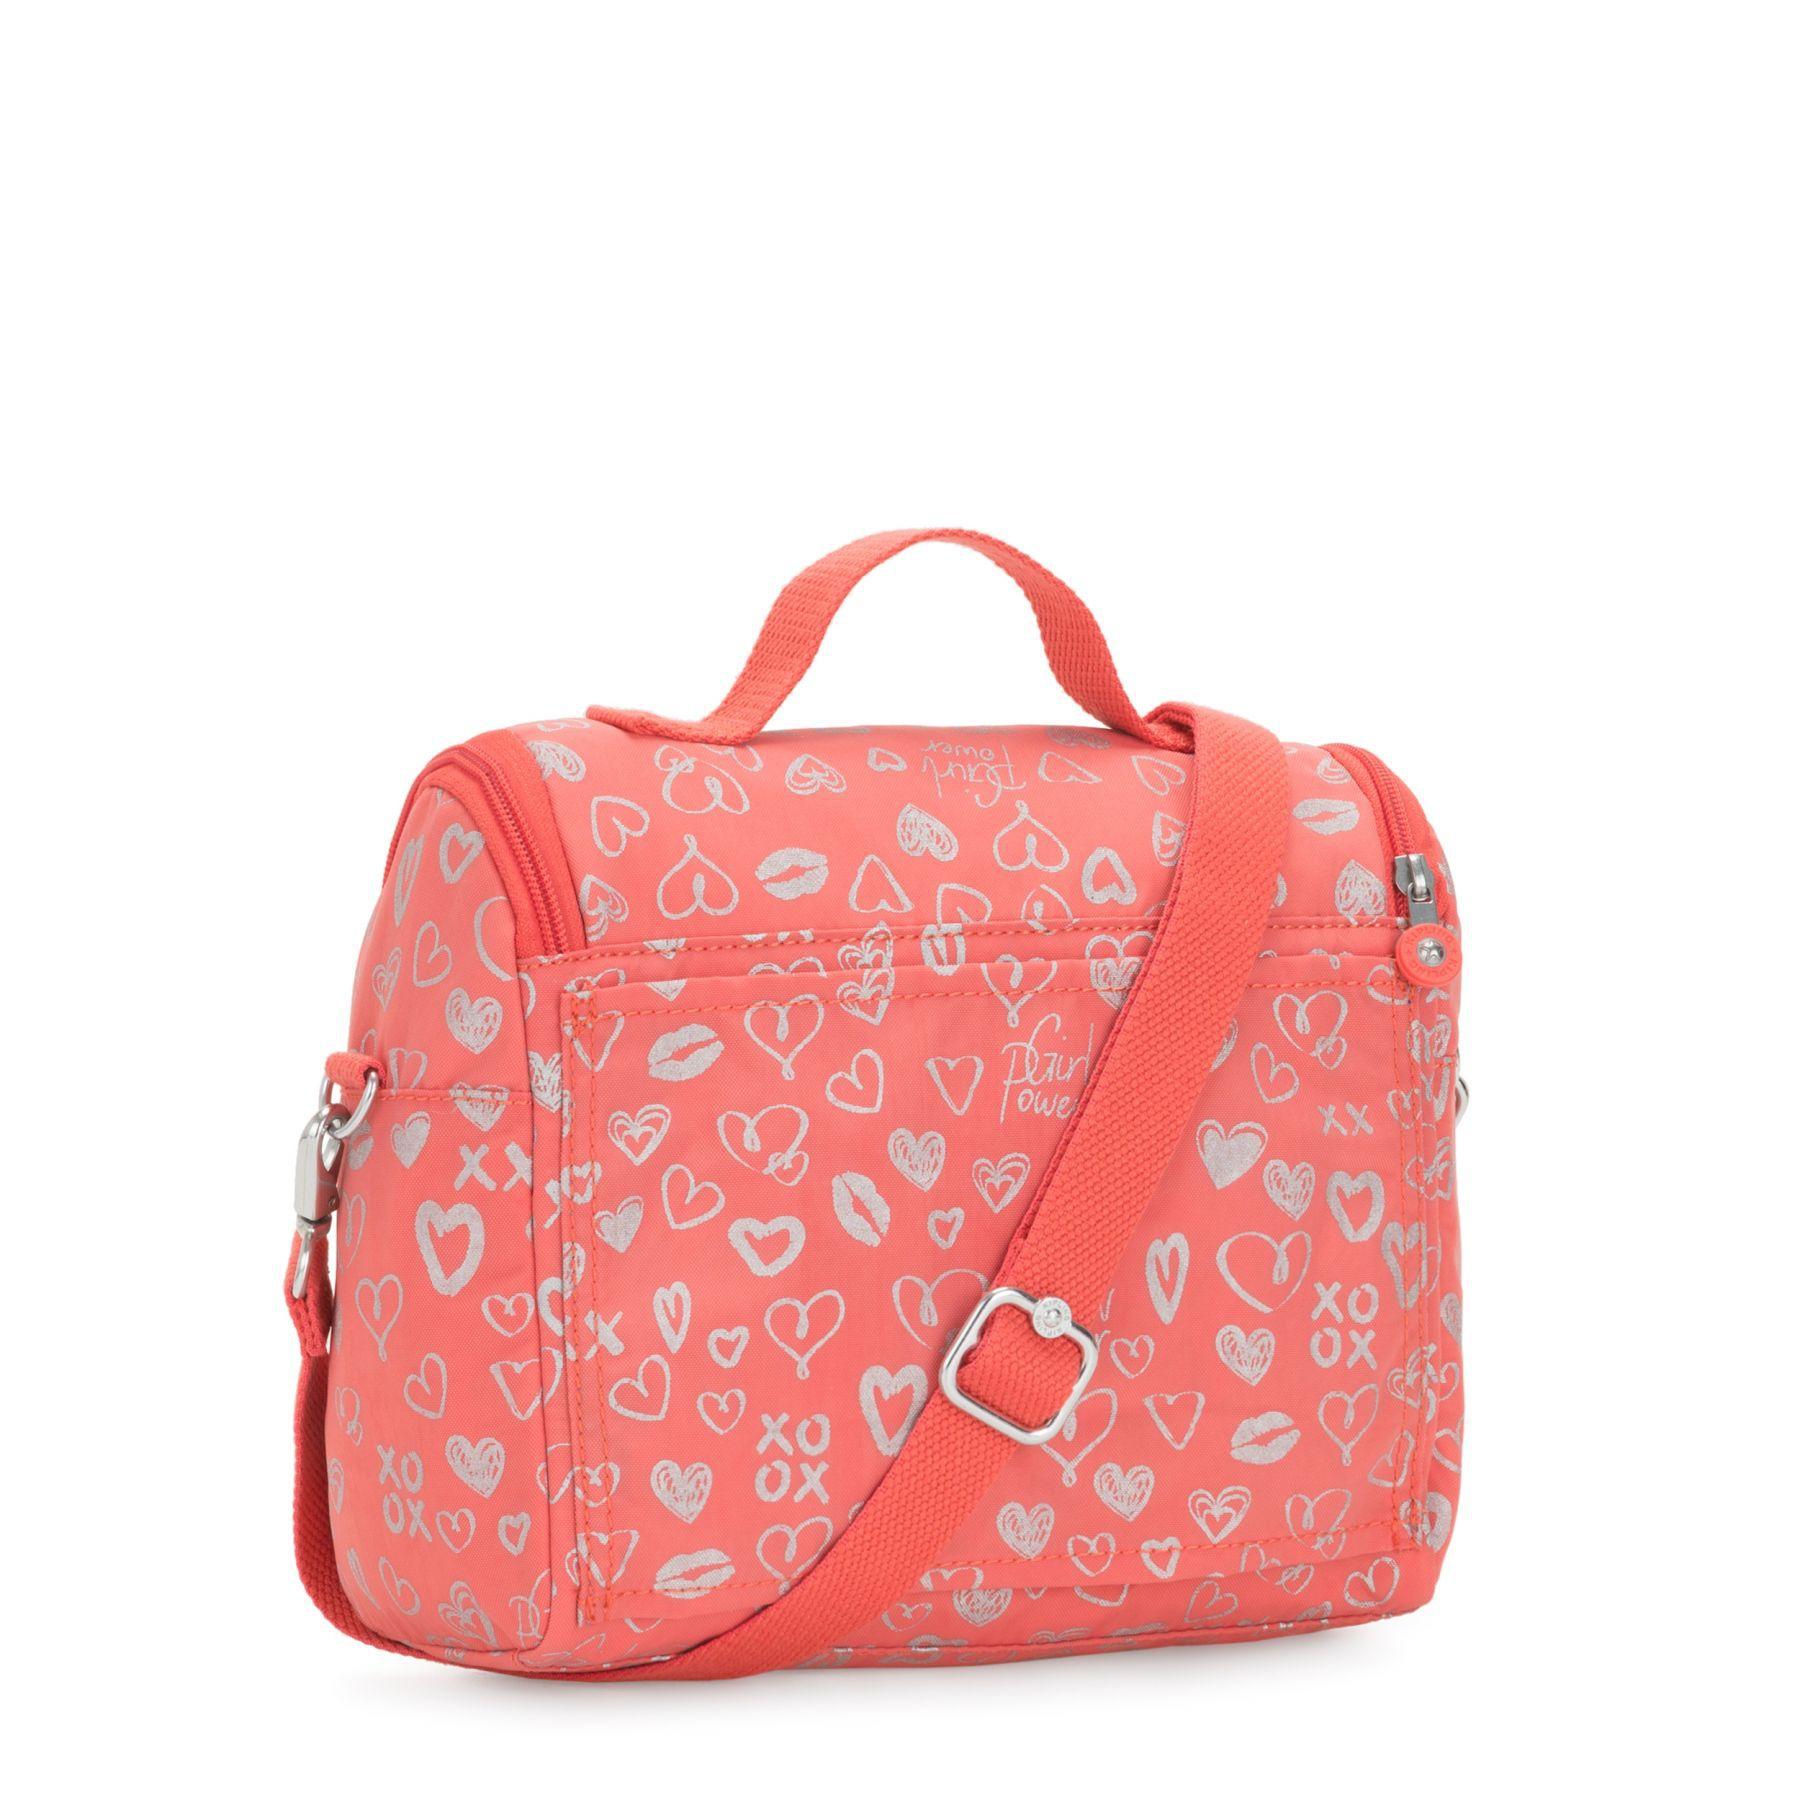 Lancheira New Kichirou Kipling Hearthy Pink